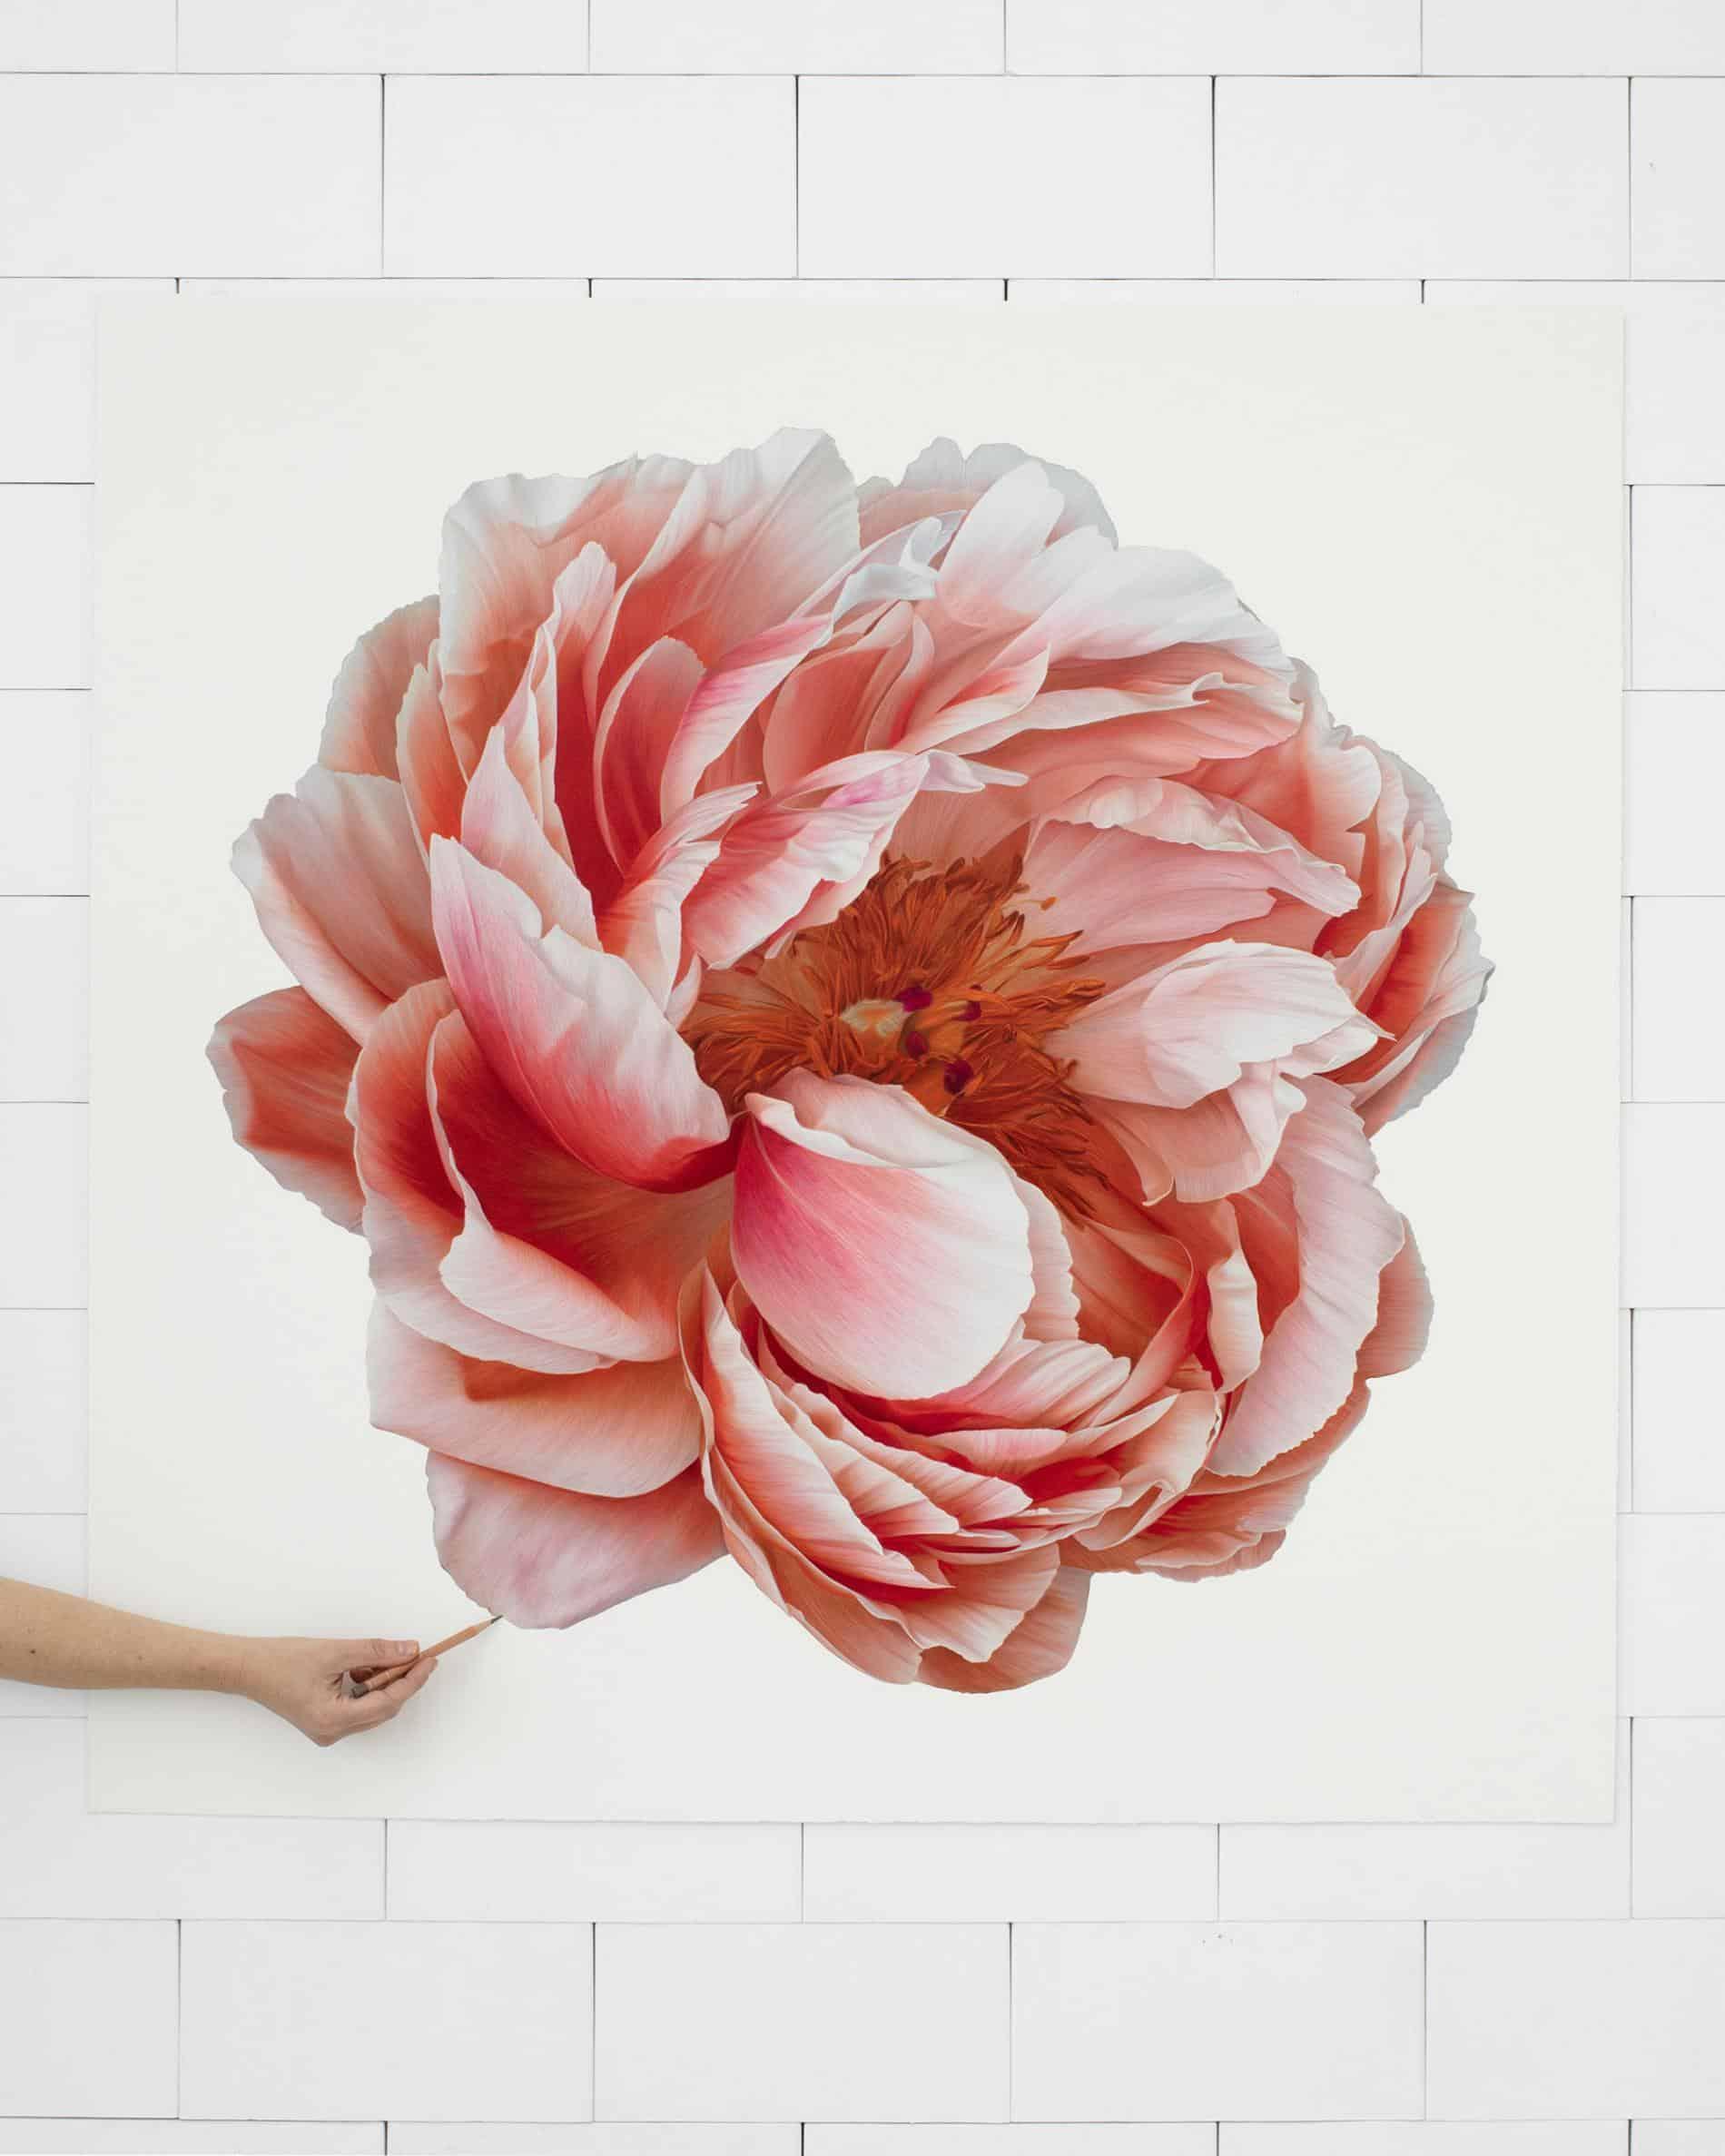 hendry flor bloom